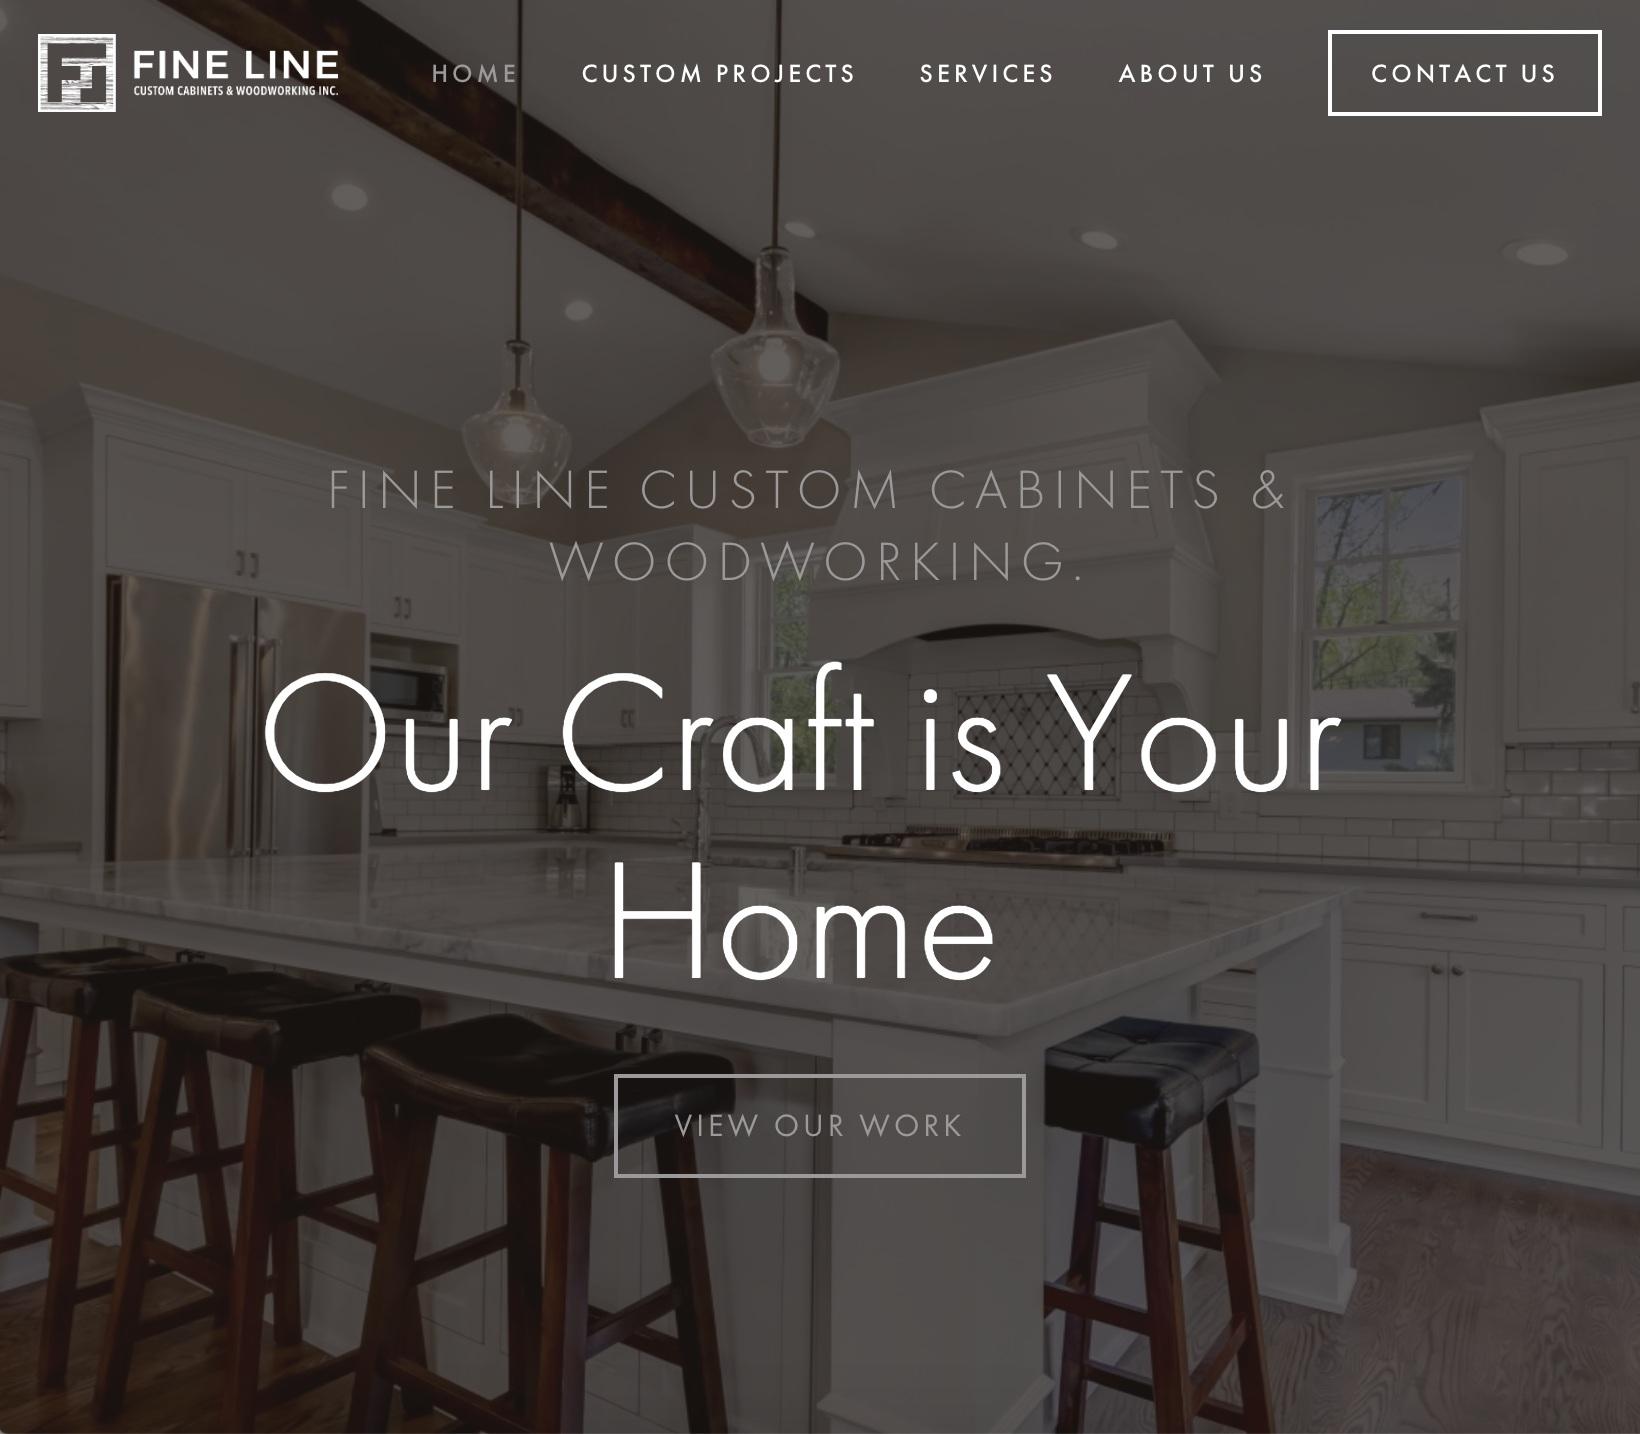 Fine Line Custom Cabinets